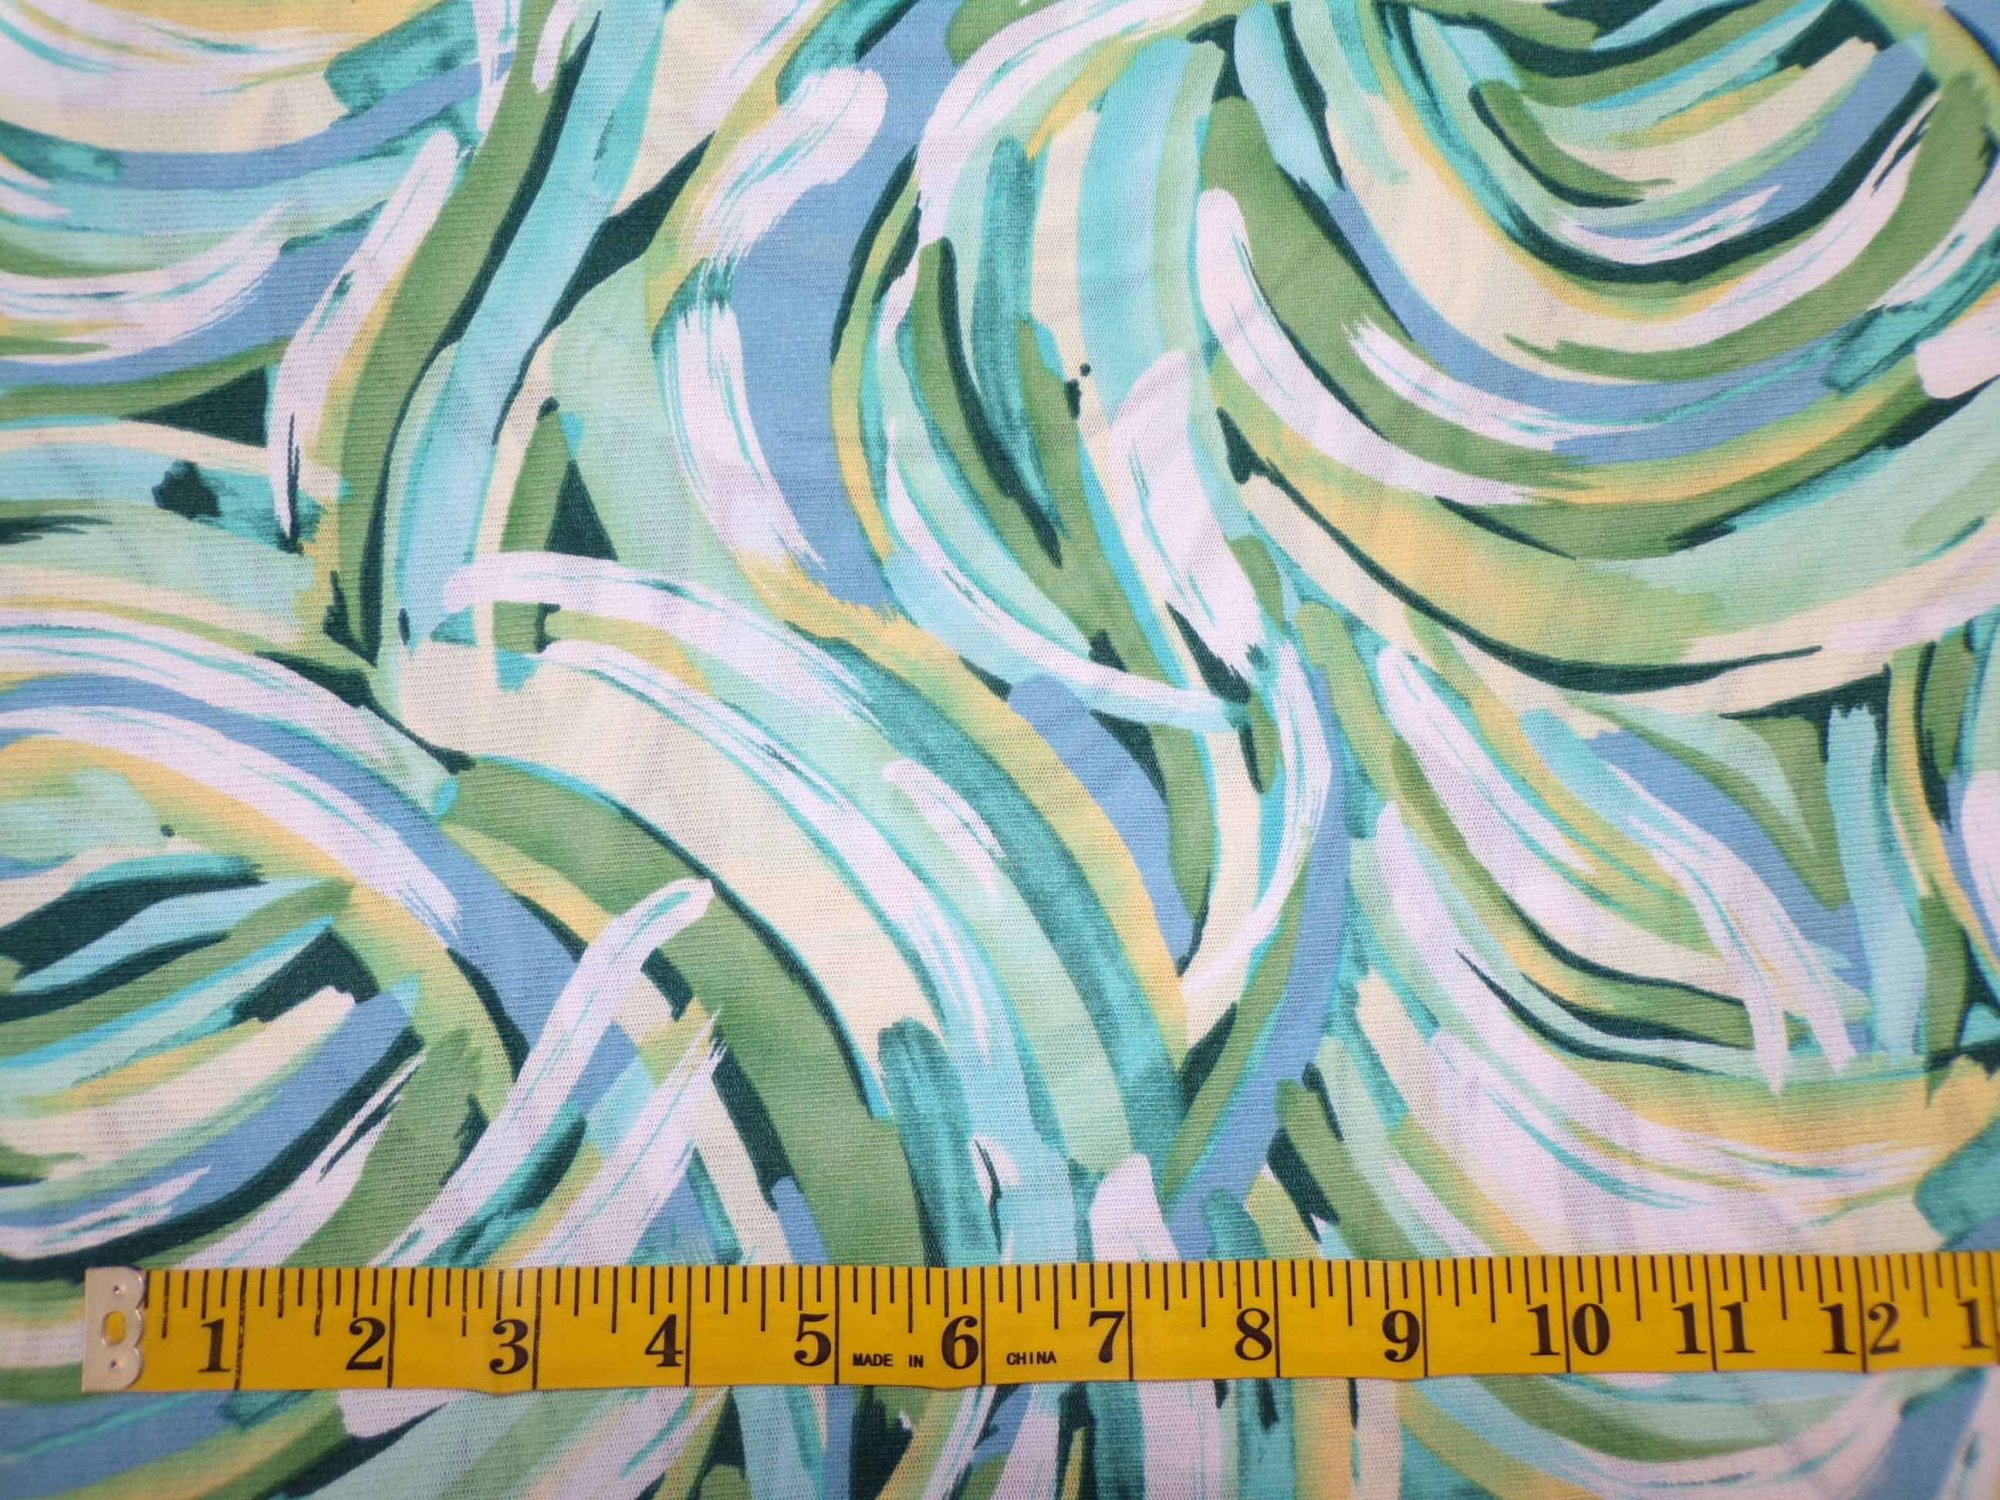 Stretch Mesh -Blue, Green, and Yellow Swirls